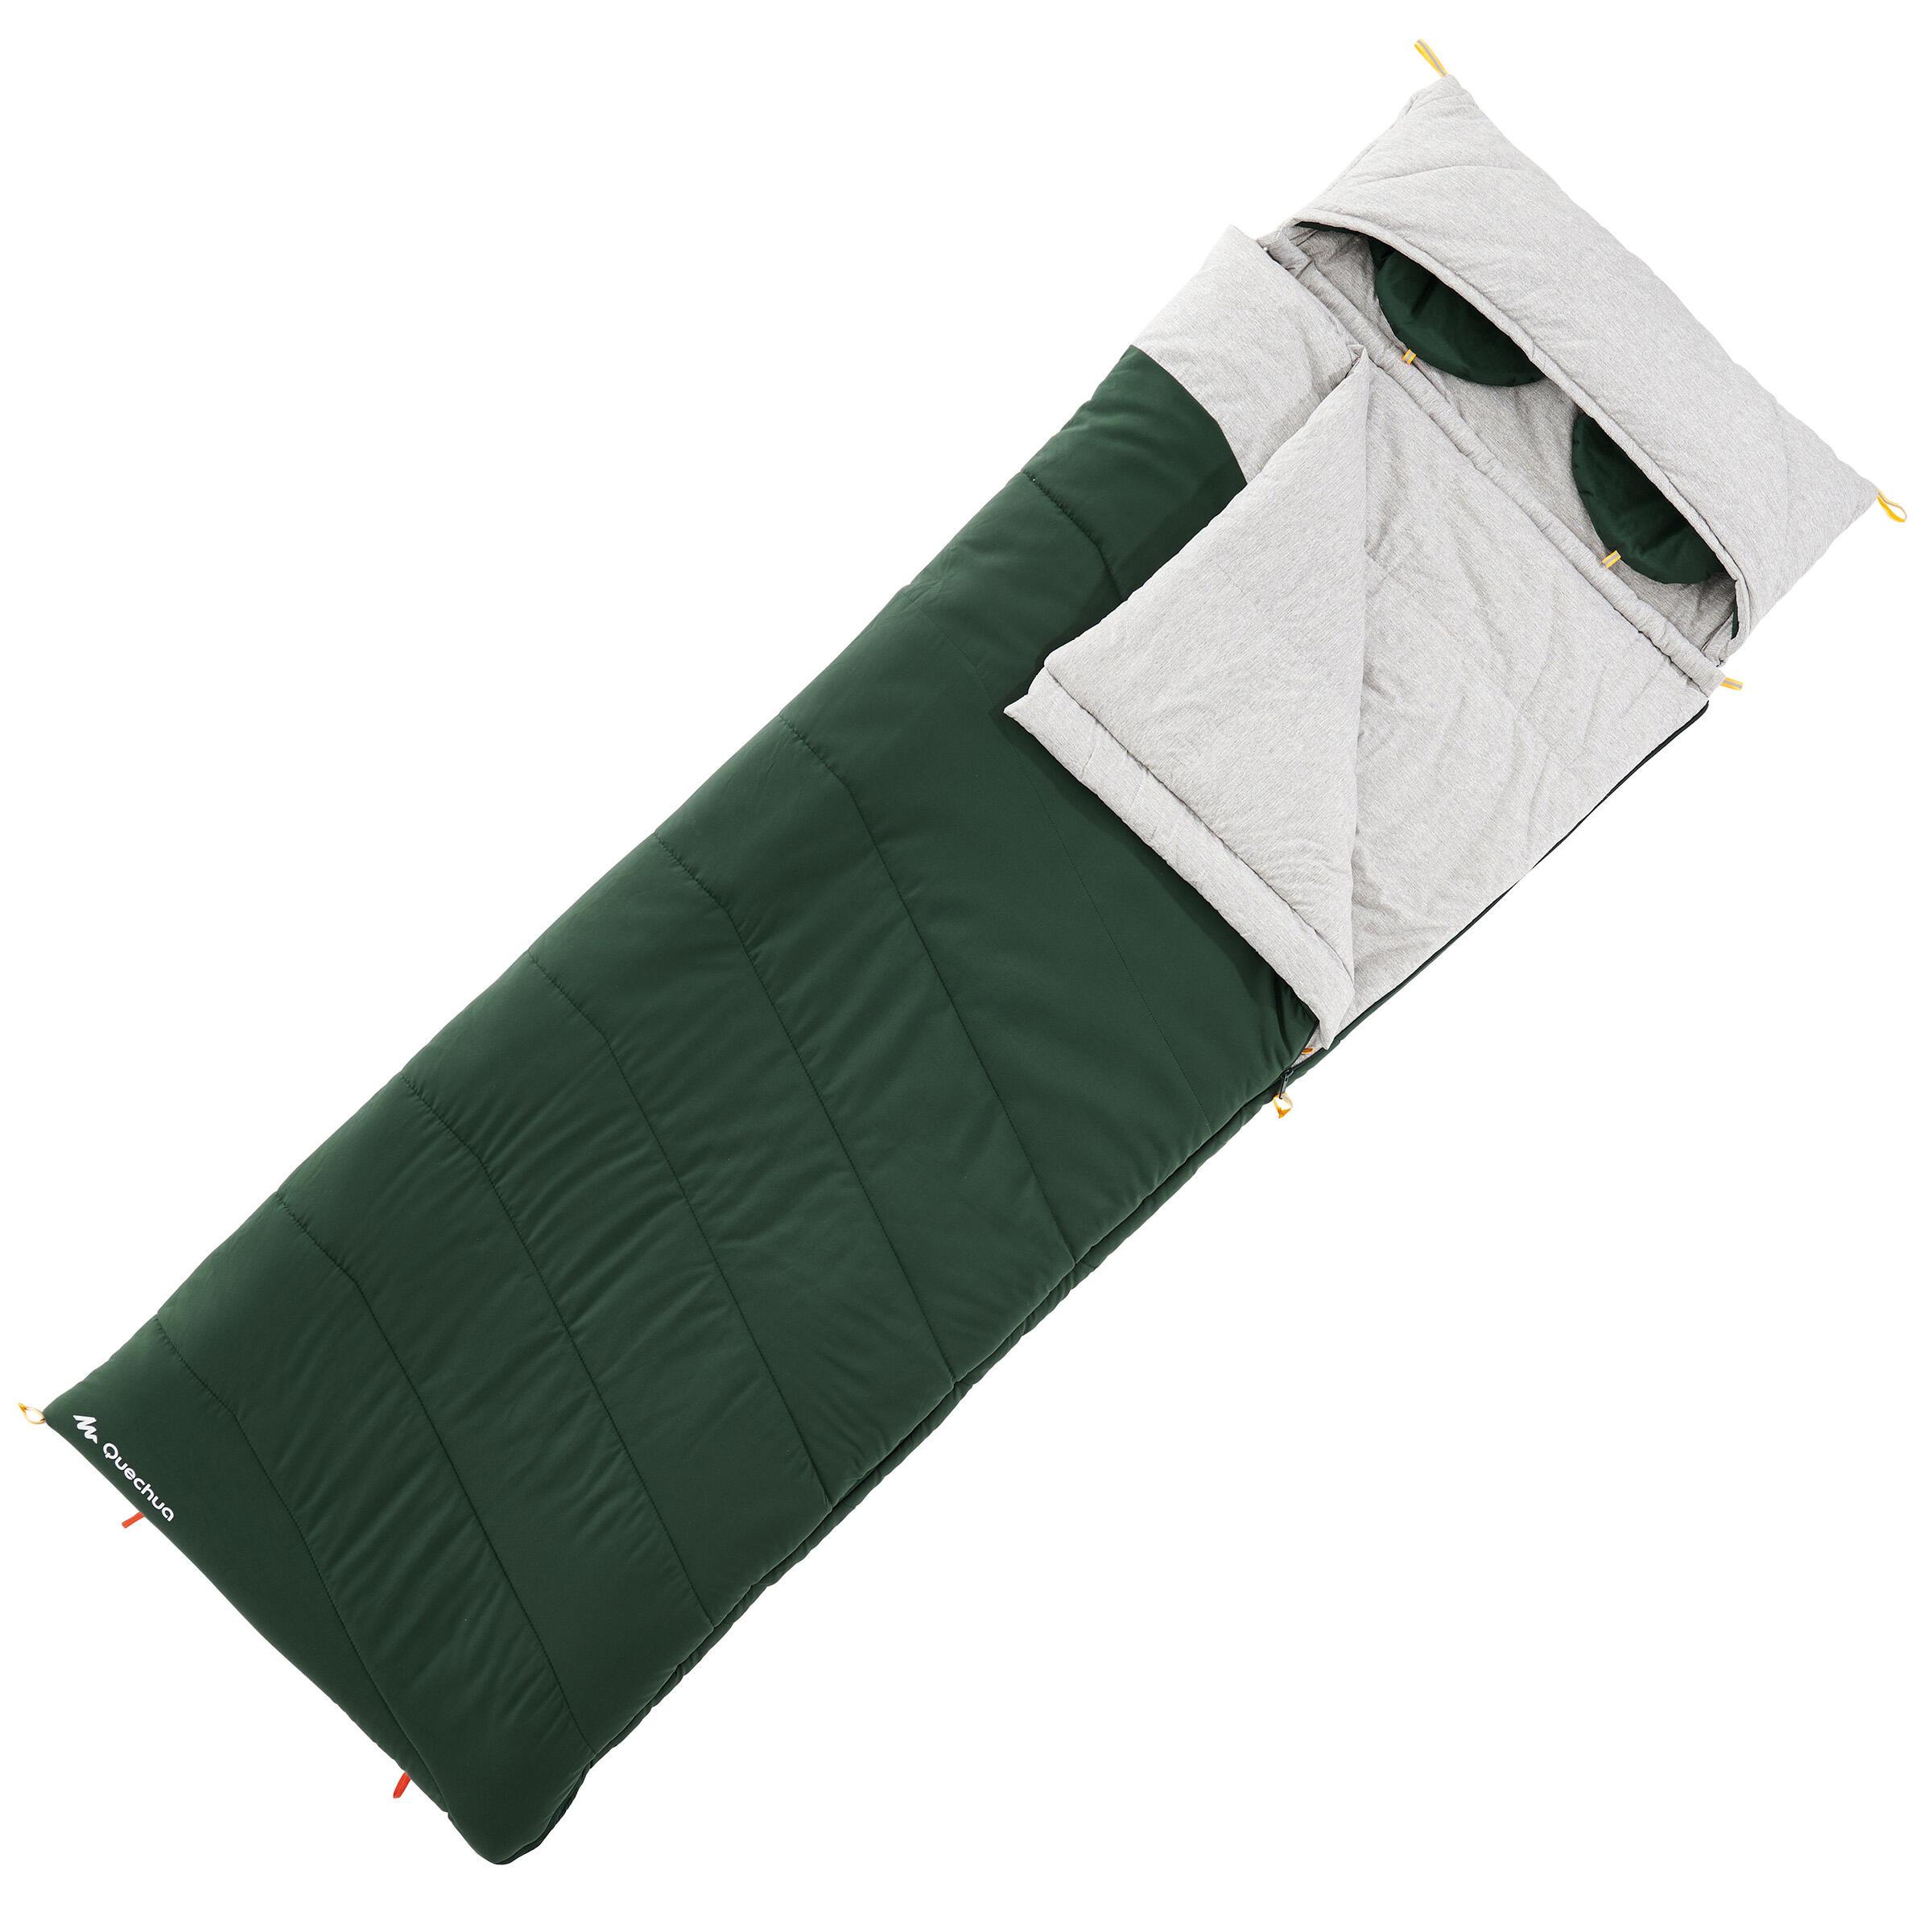 Sac de dormit Arpenaz 0° Verde